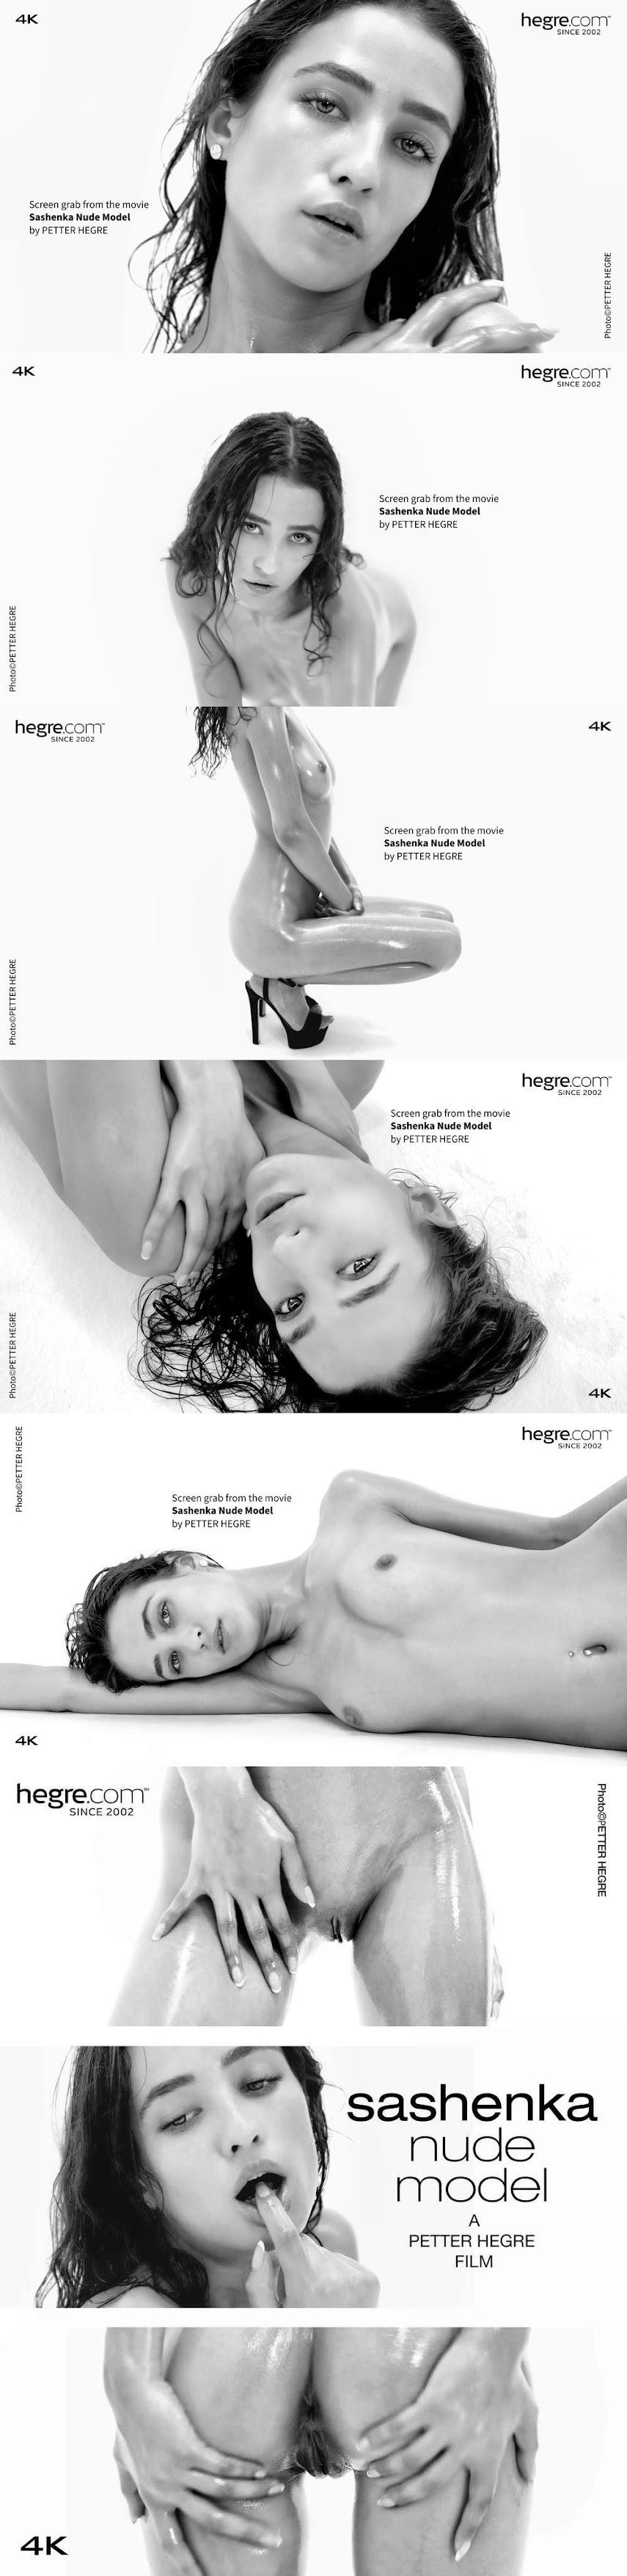 [Art] Sashenka - Nude Model